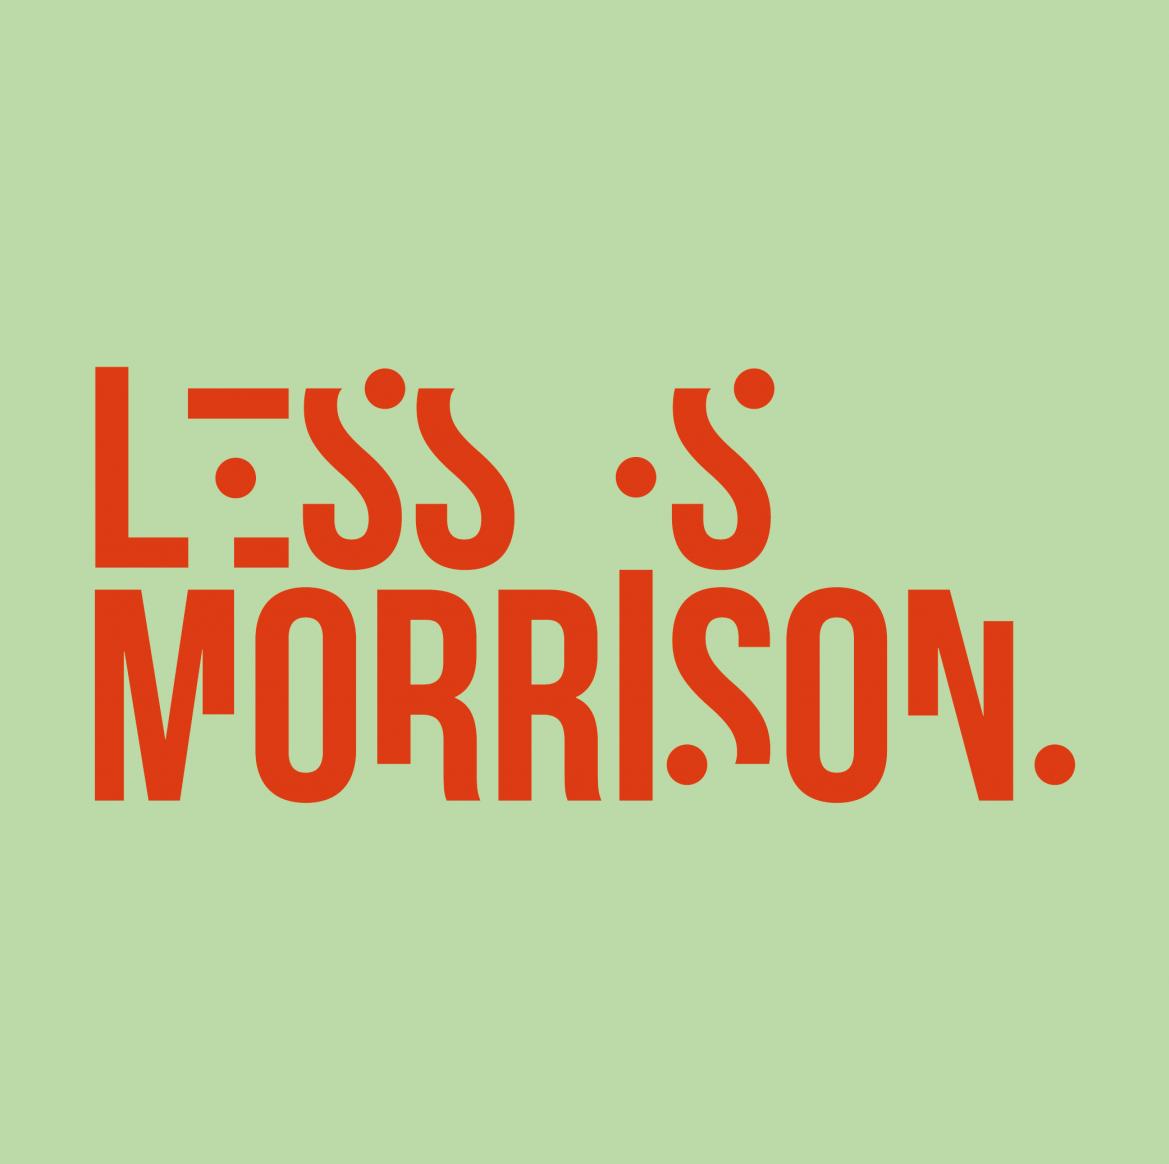 Lss.s Mrrsn